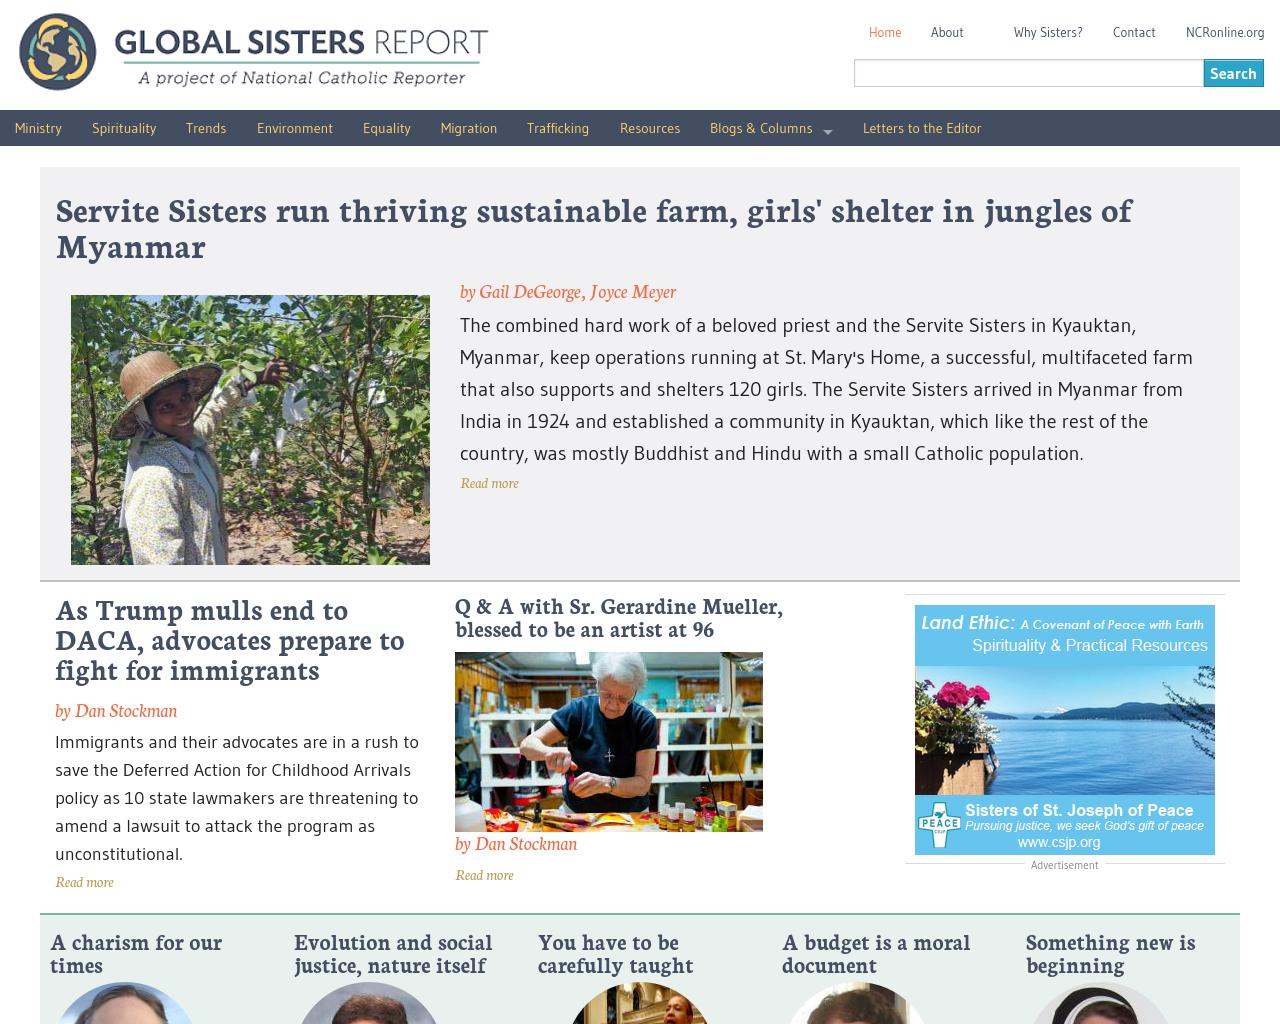 Global-Sisters-Report-Advertising-Reviews-Pricing